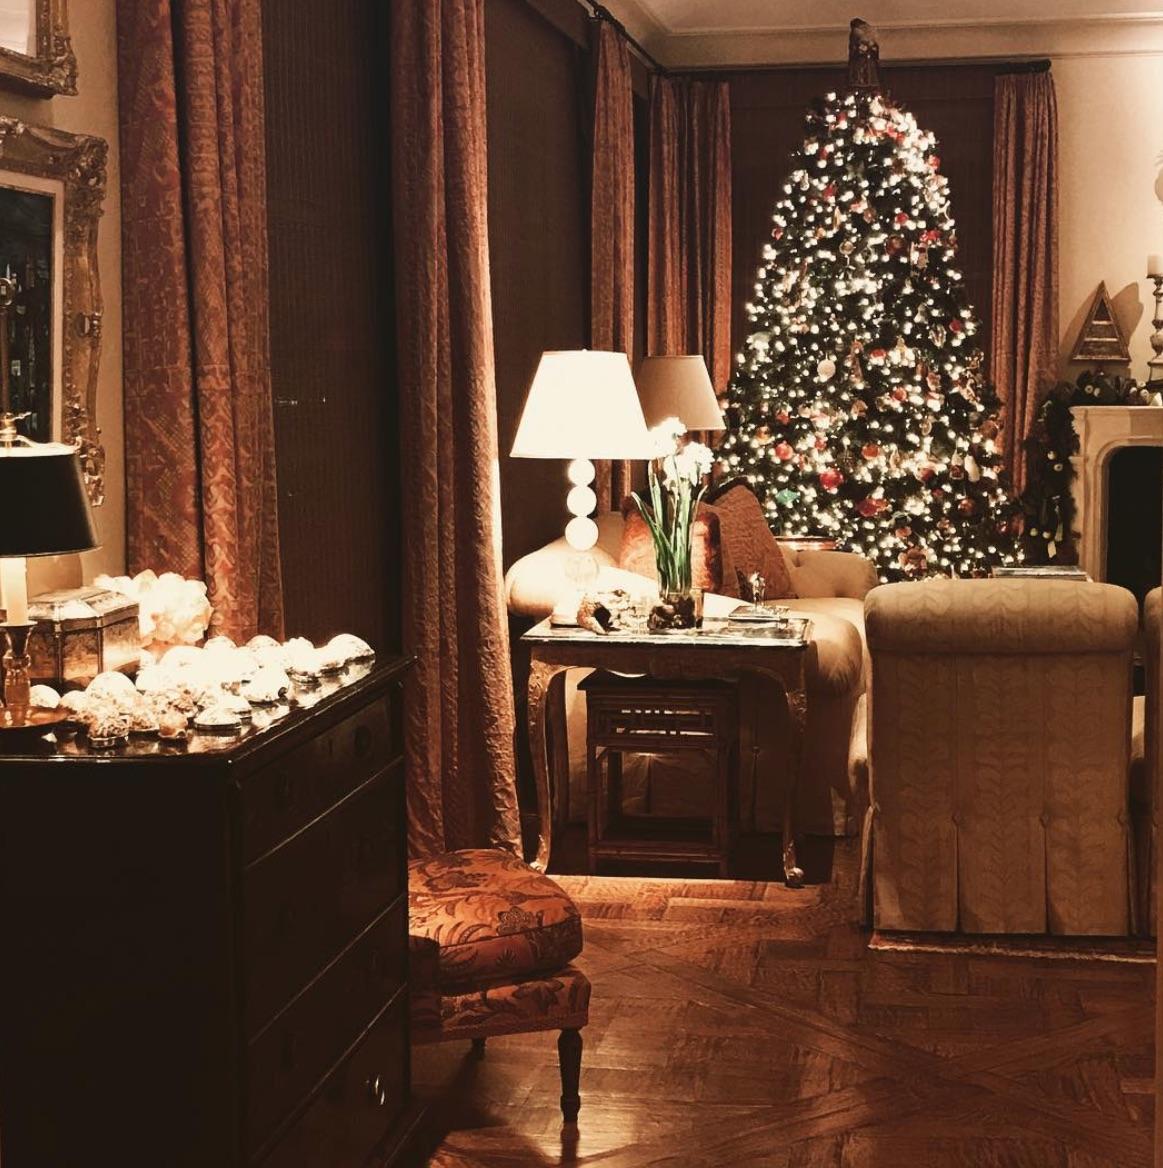 Tucker's home last Christmas